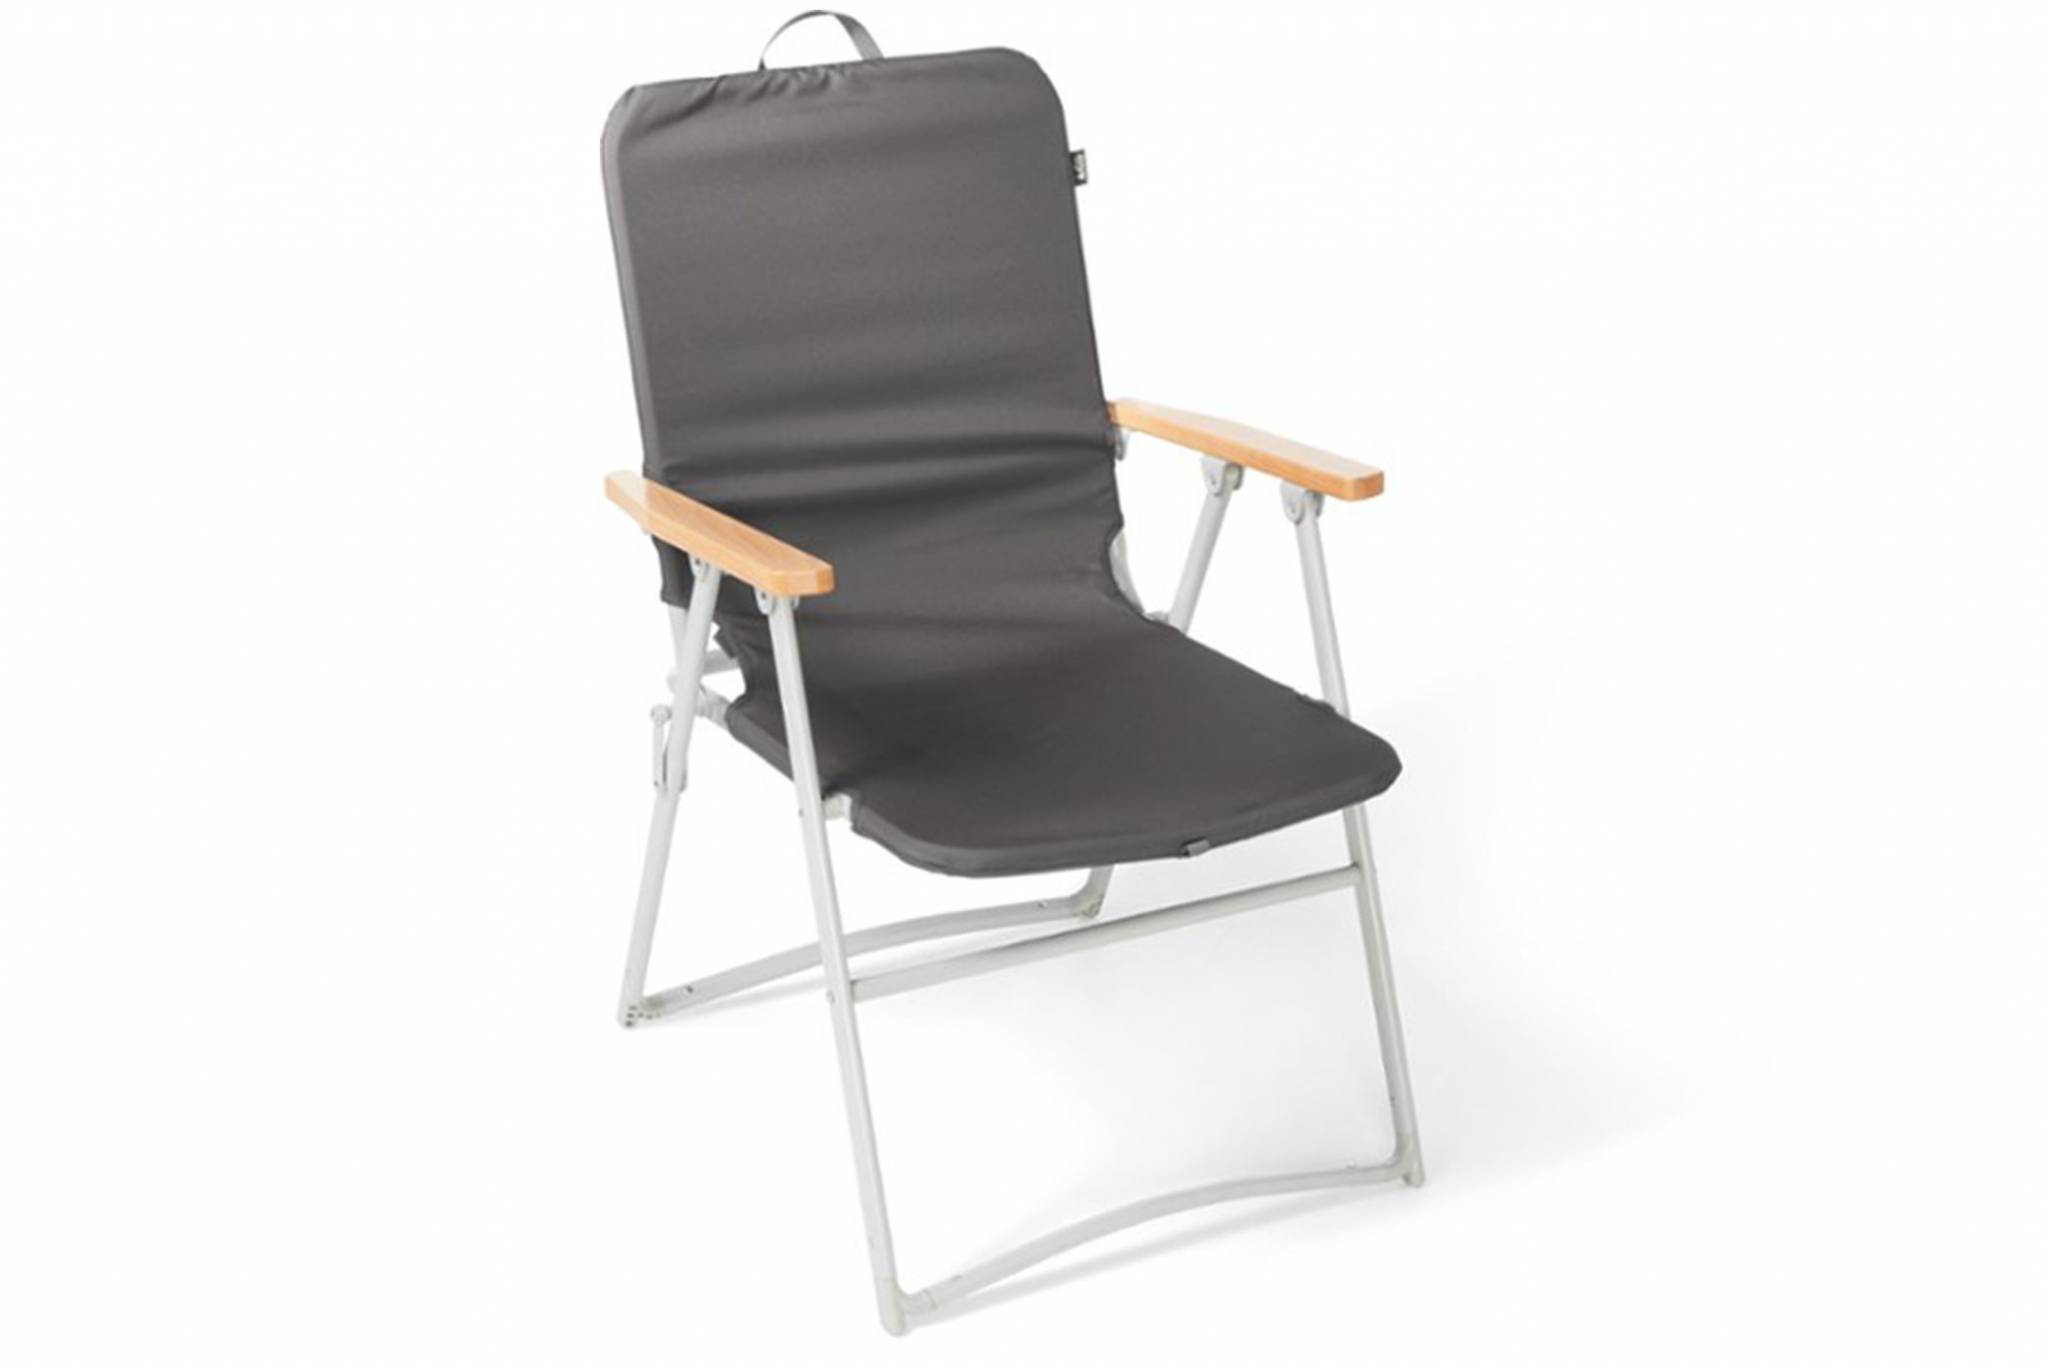 REI Outward Lawn Chair